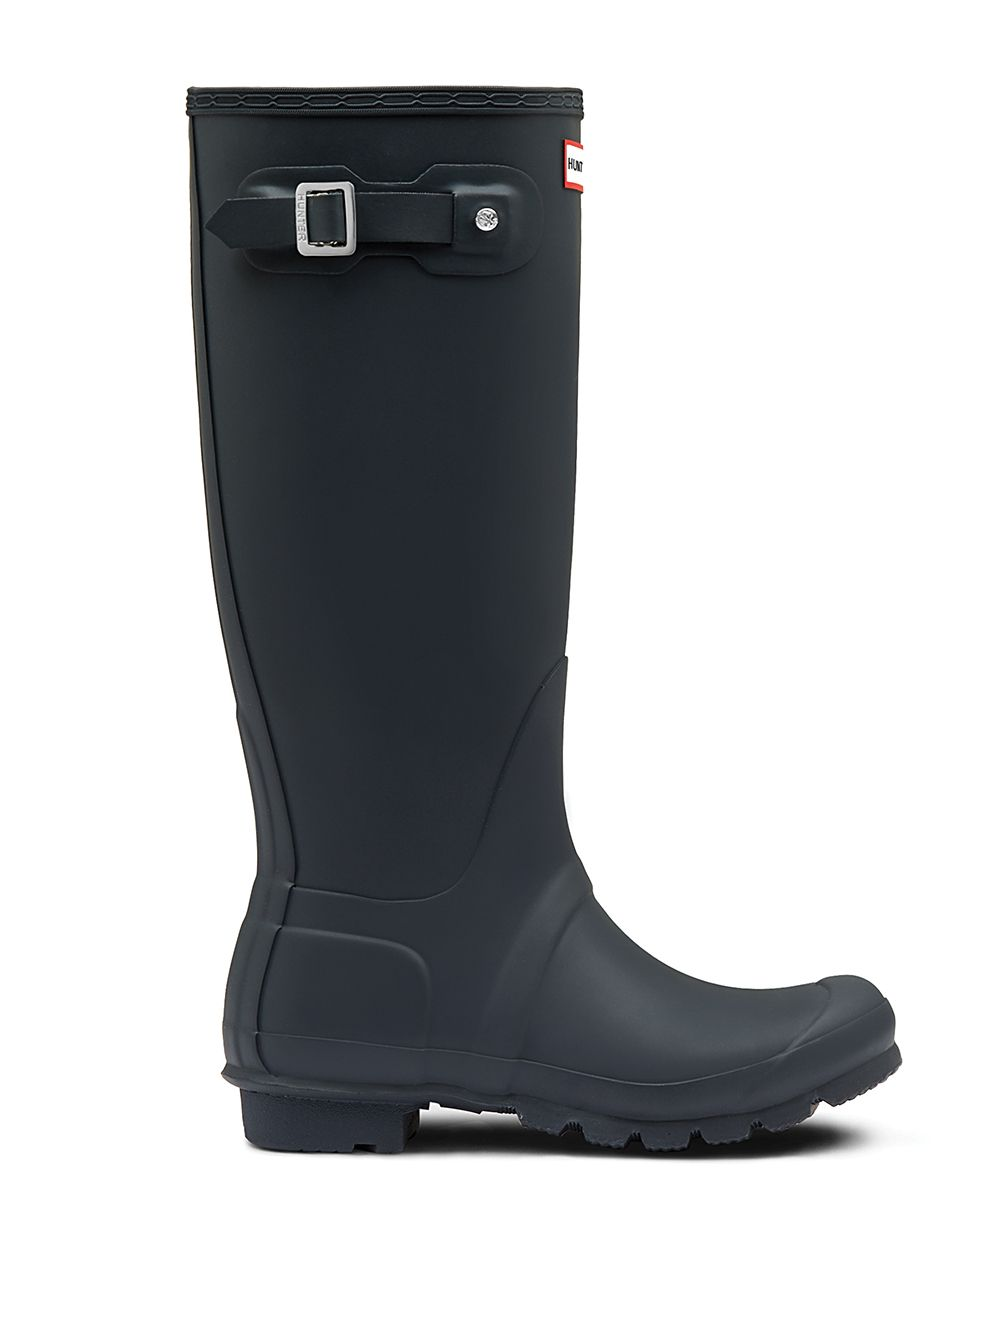 Wellington original tall boots